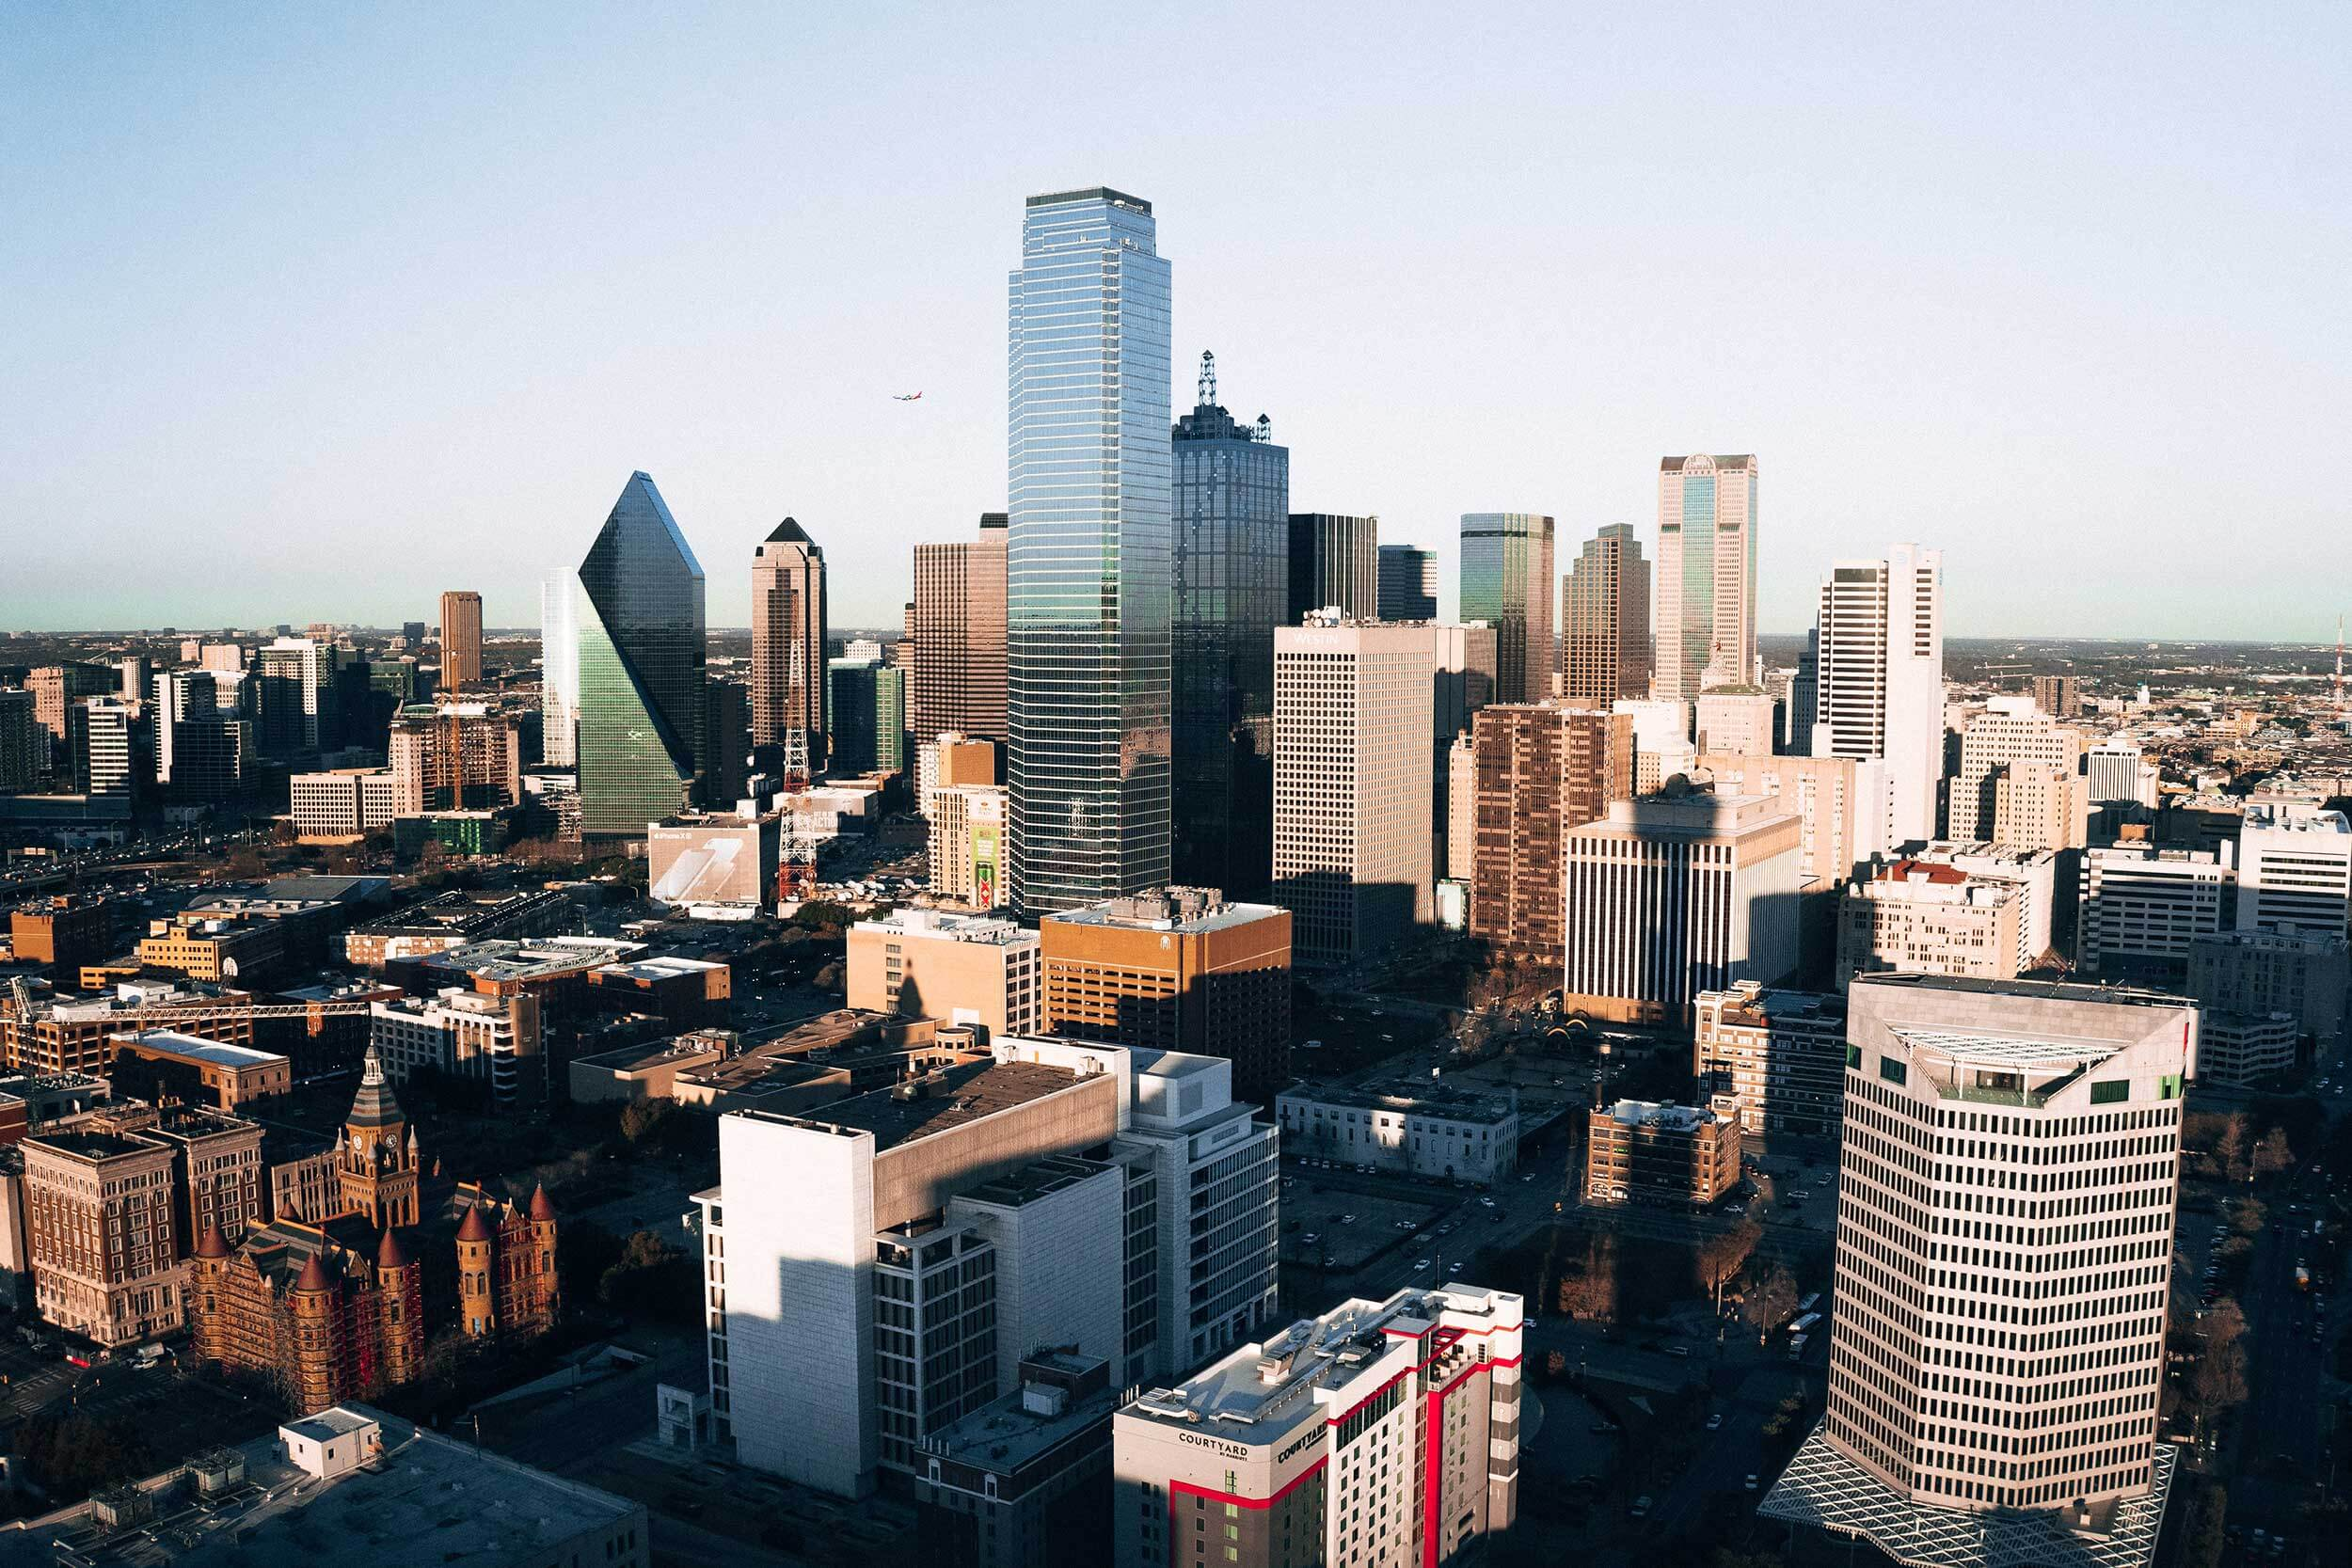 Aerial view of Dallas, Texas